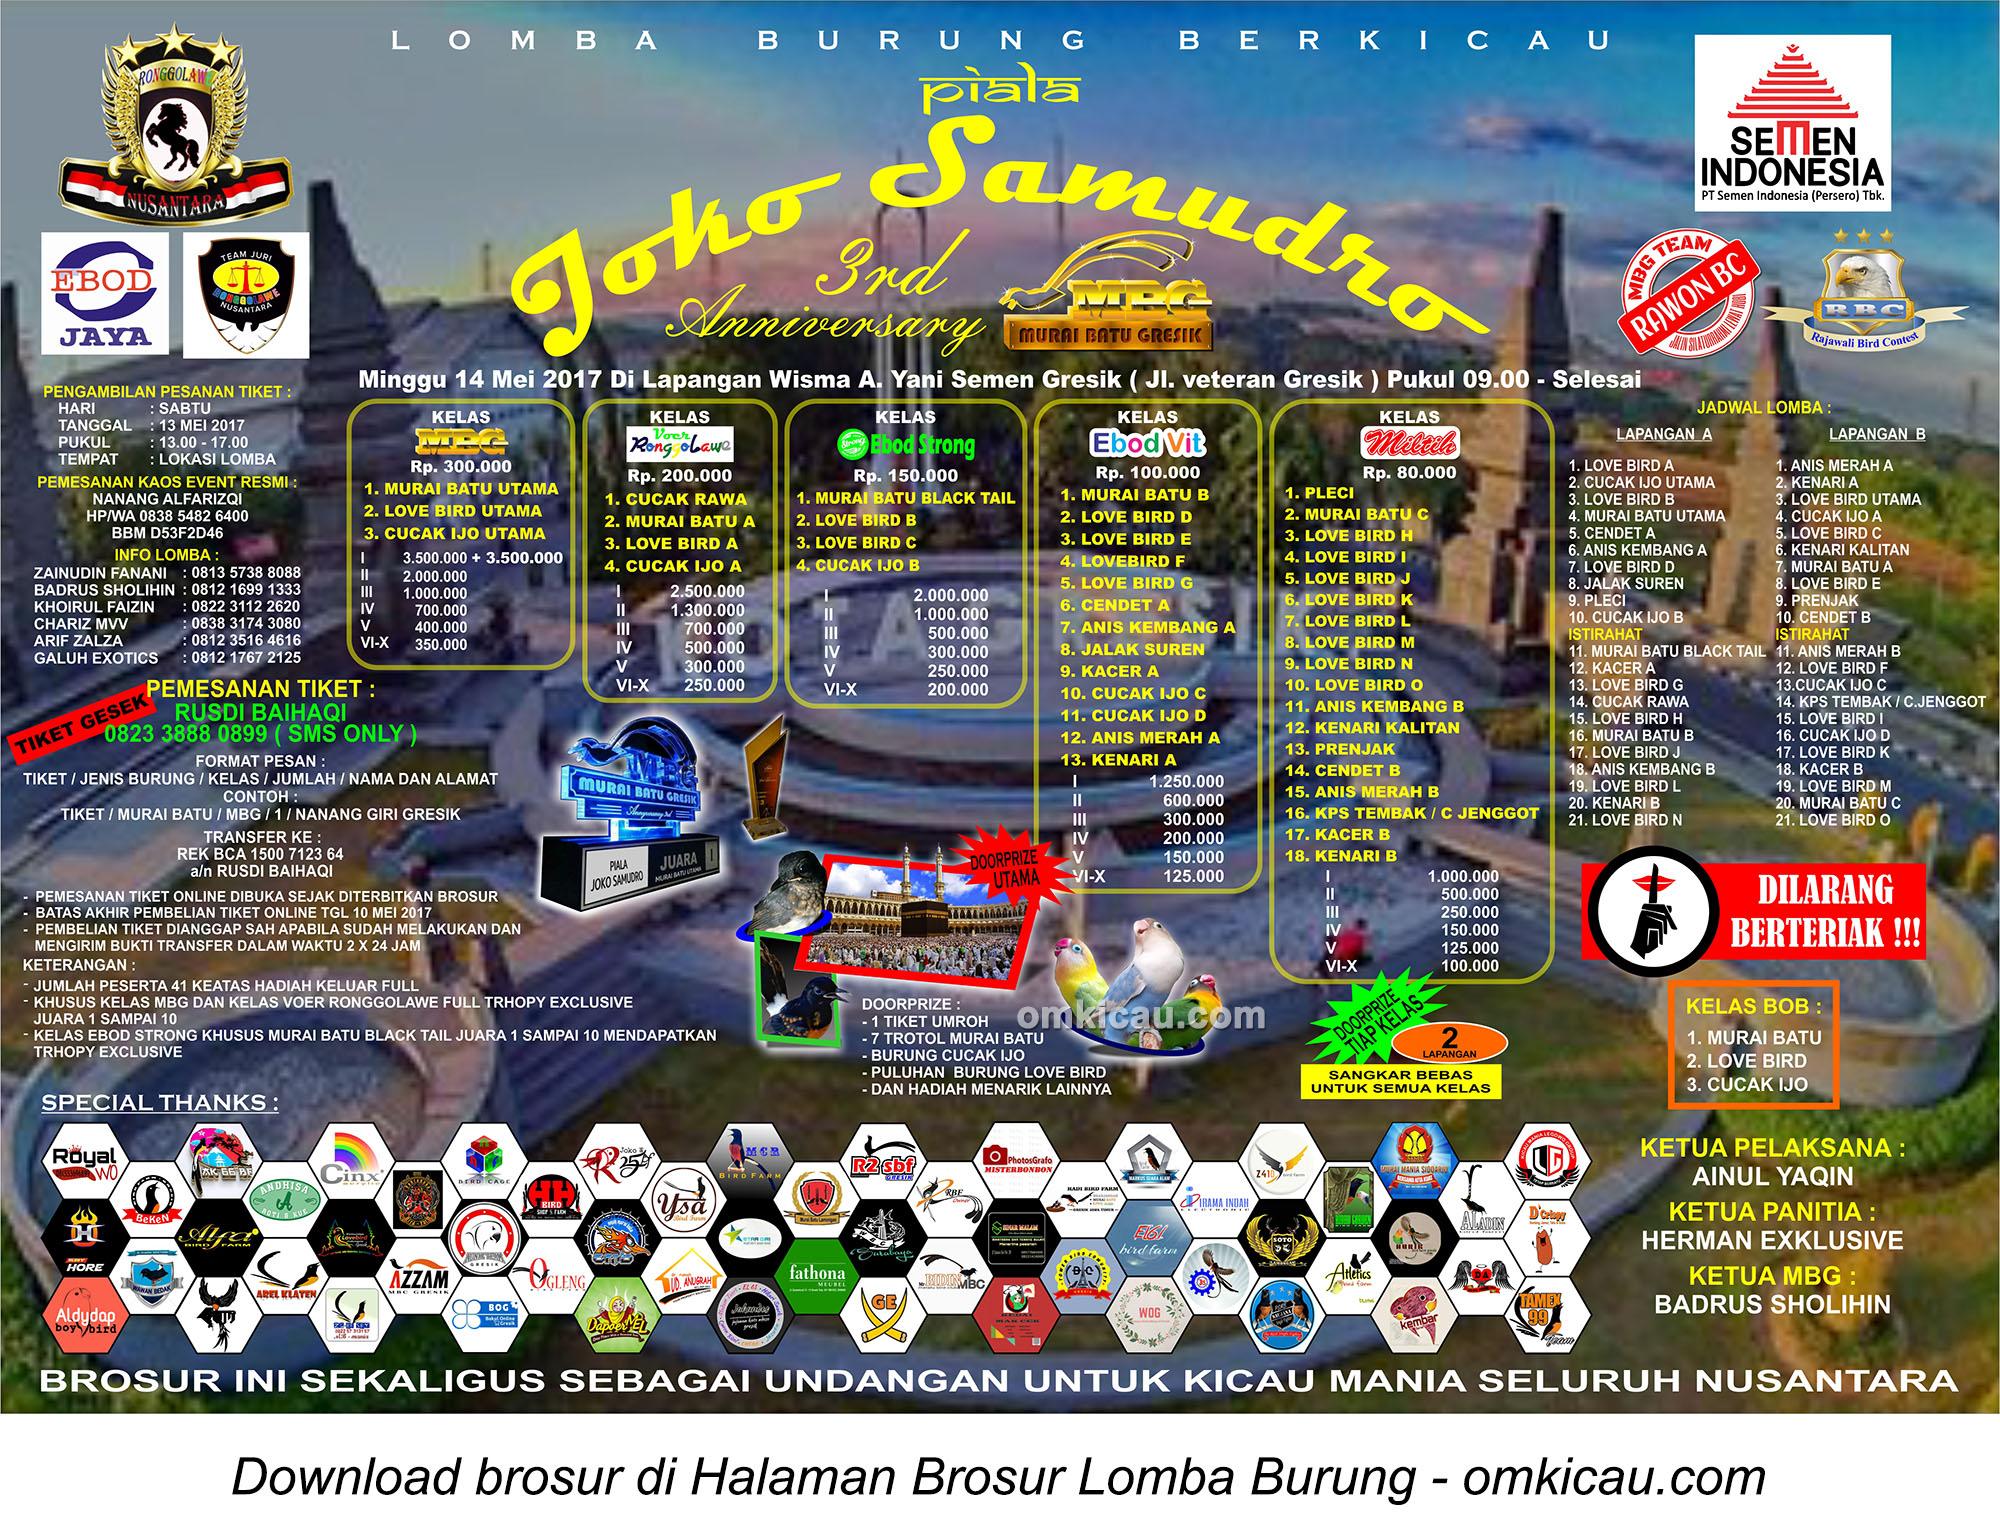 Brosur Lomba Burung Berkicau Piala Joko Samudro, Gresik, 14 Mei 2017